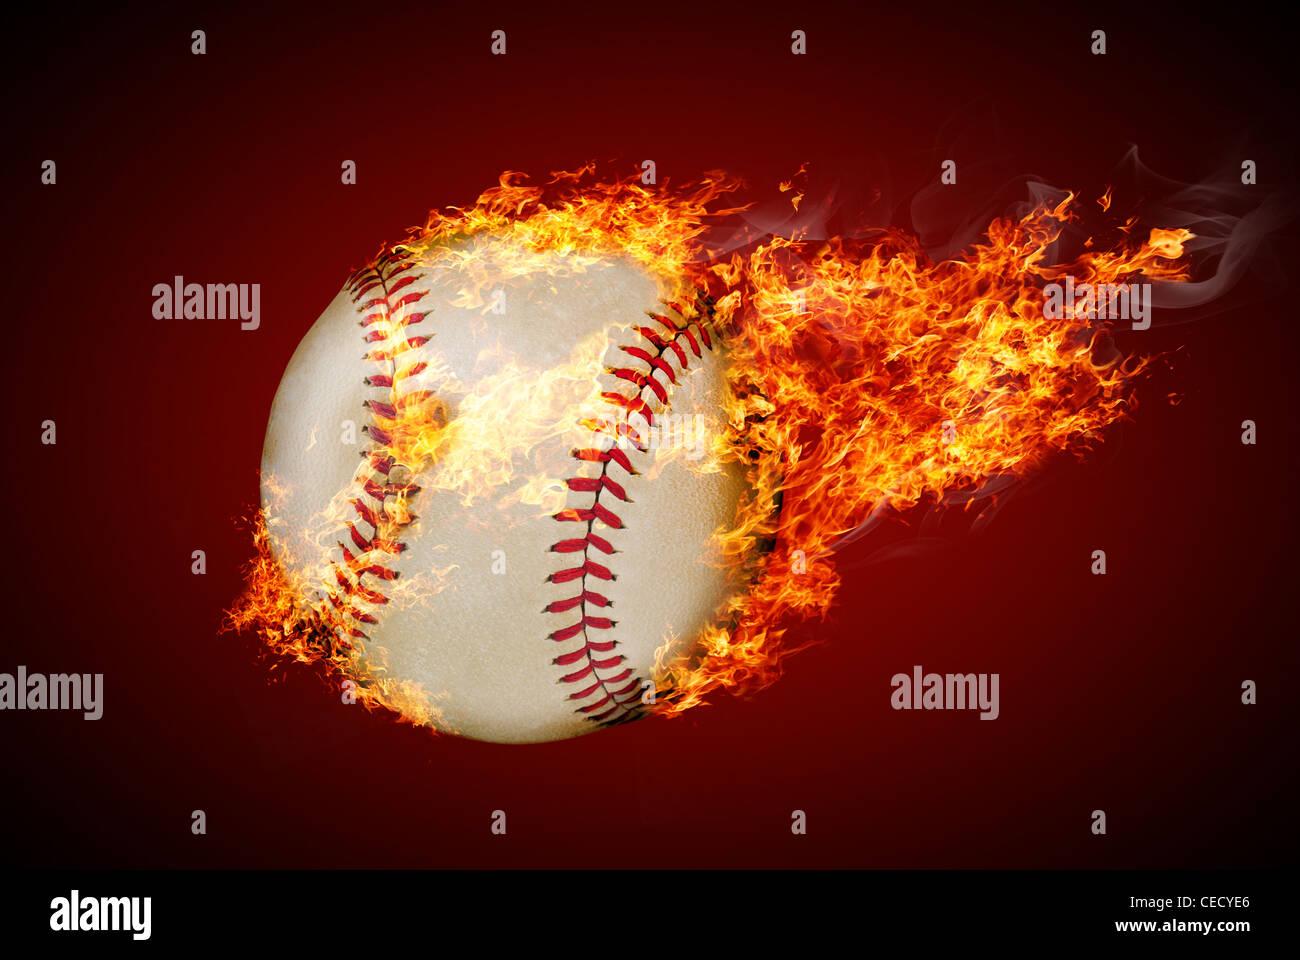 Flying baseball ball on fire - Stock Image